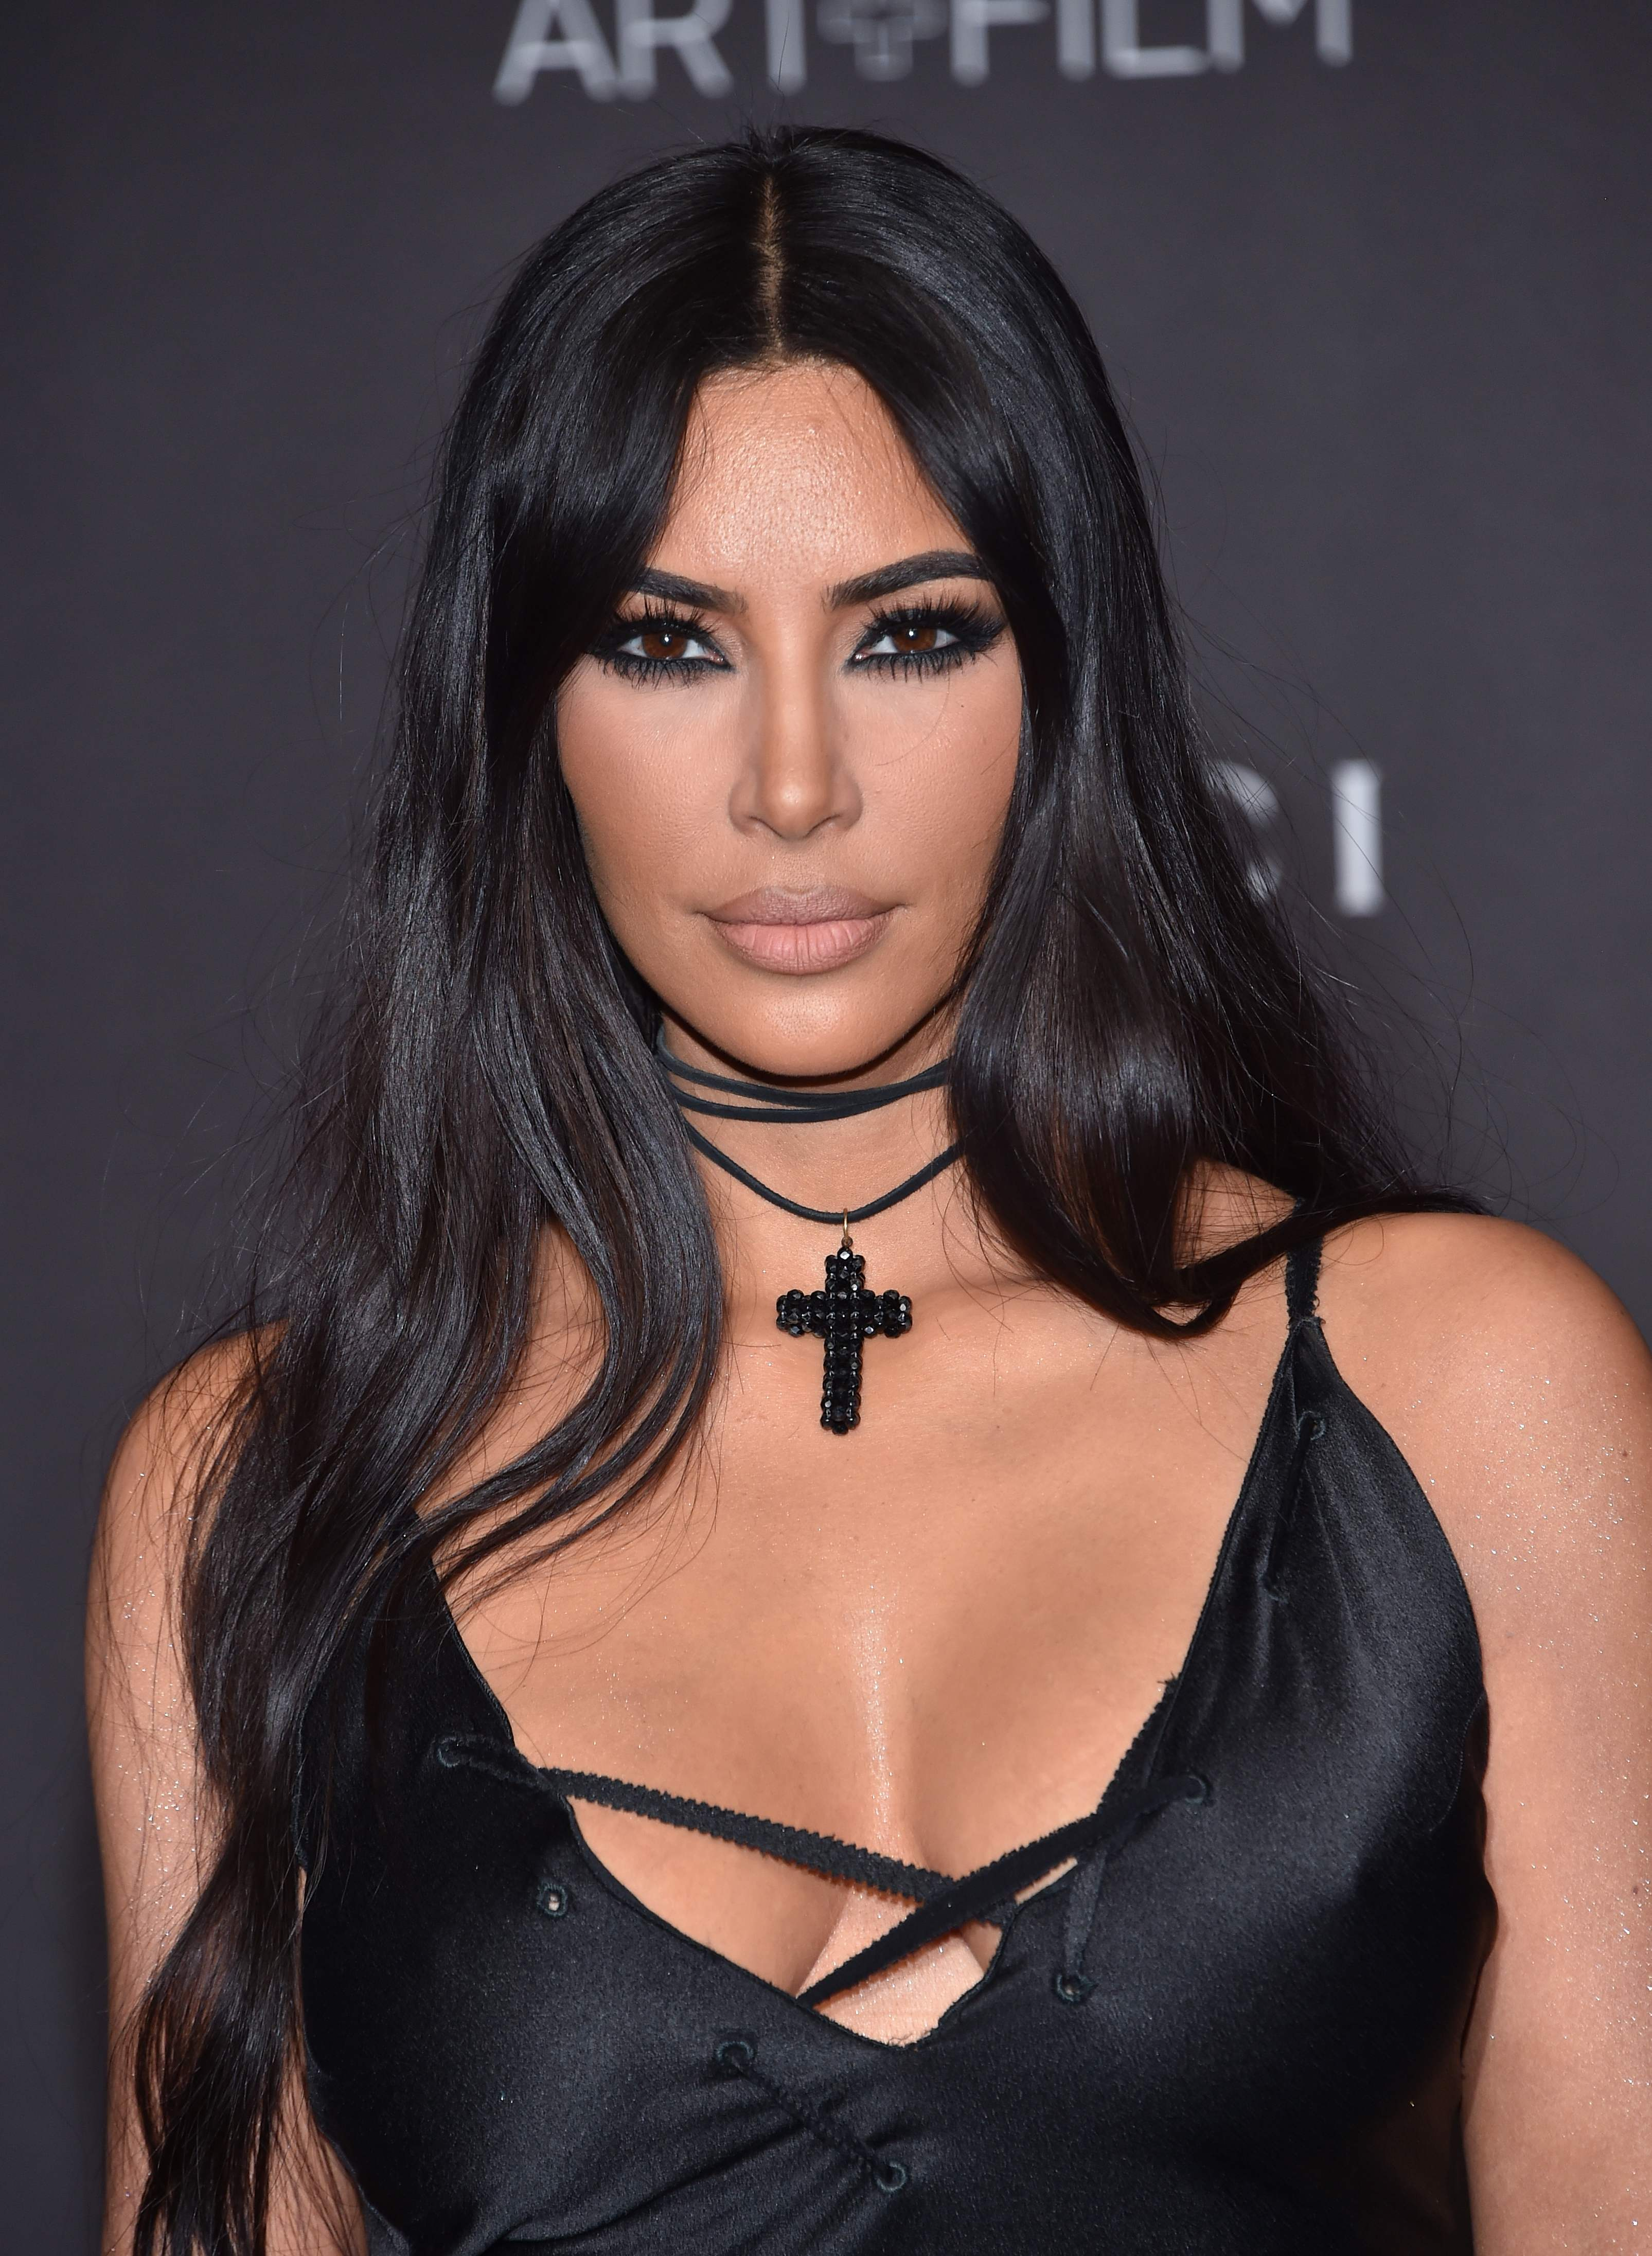 Kim kardashian sex tape link images 797